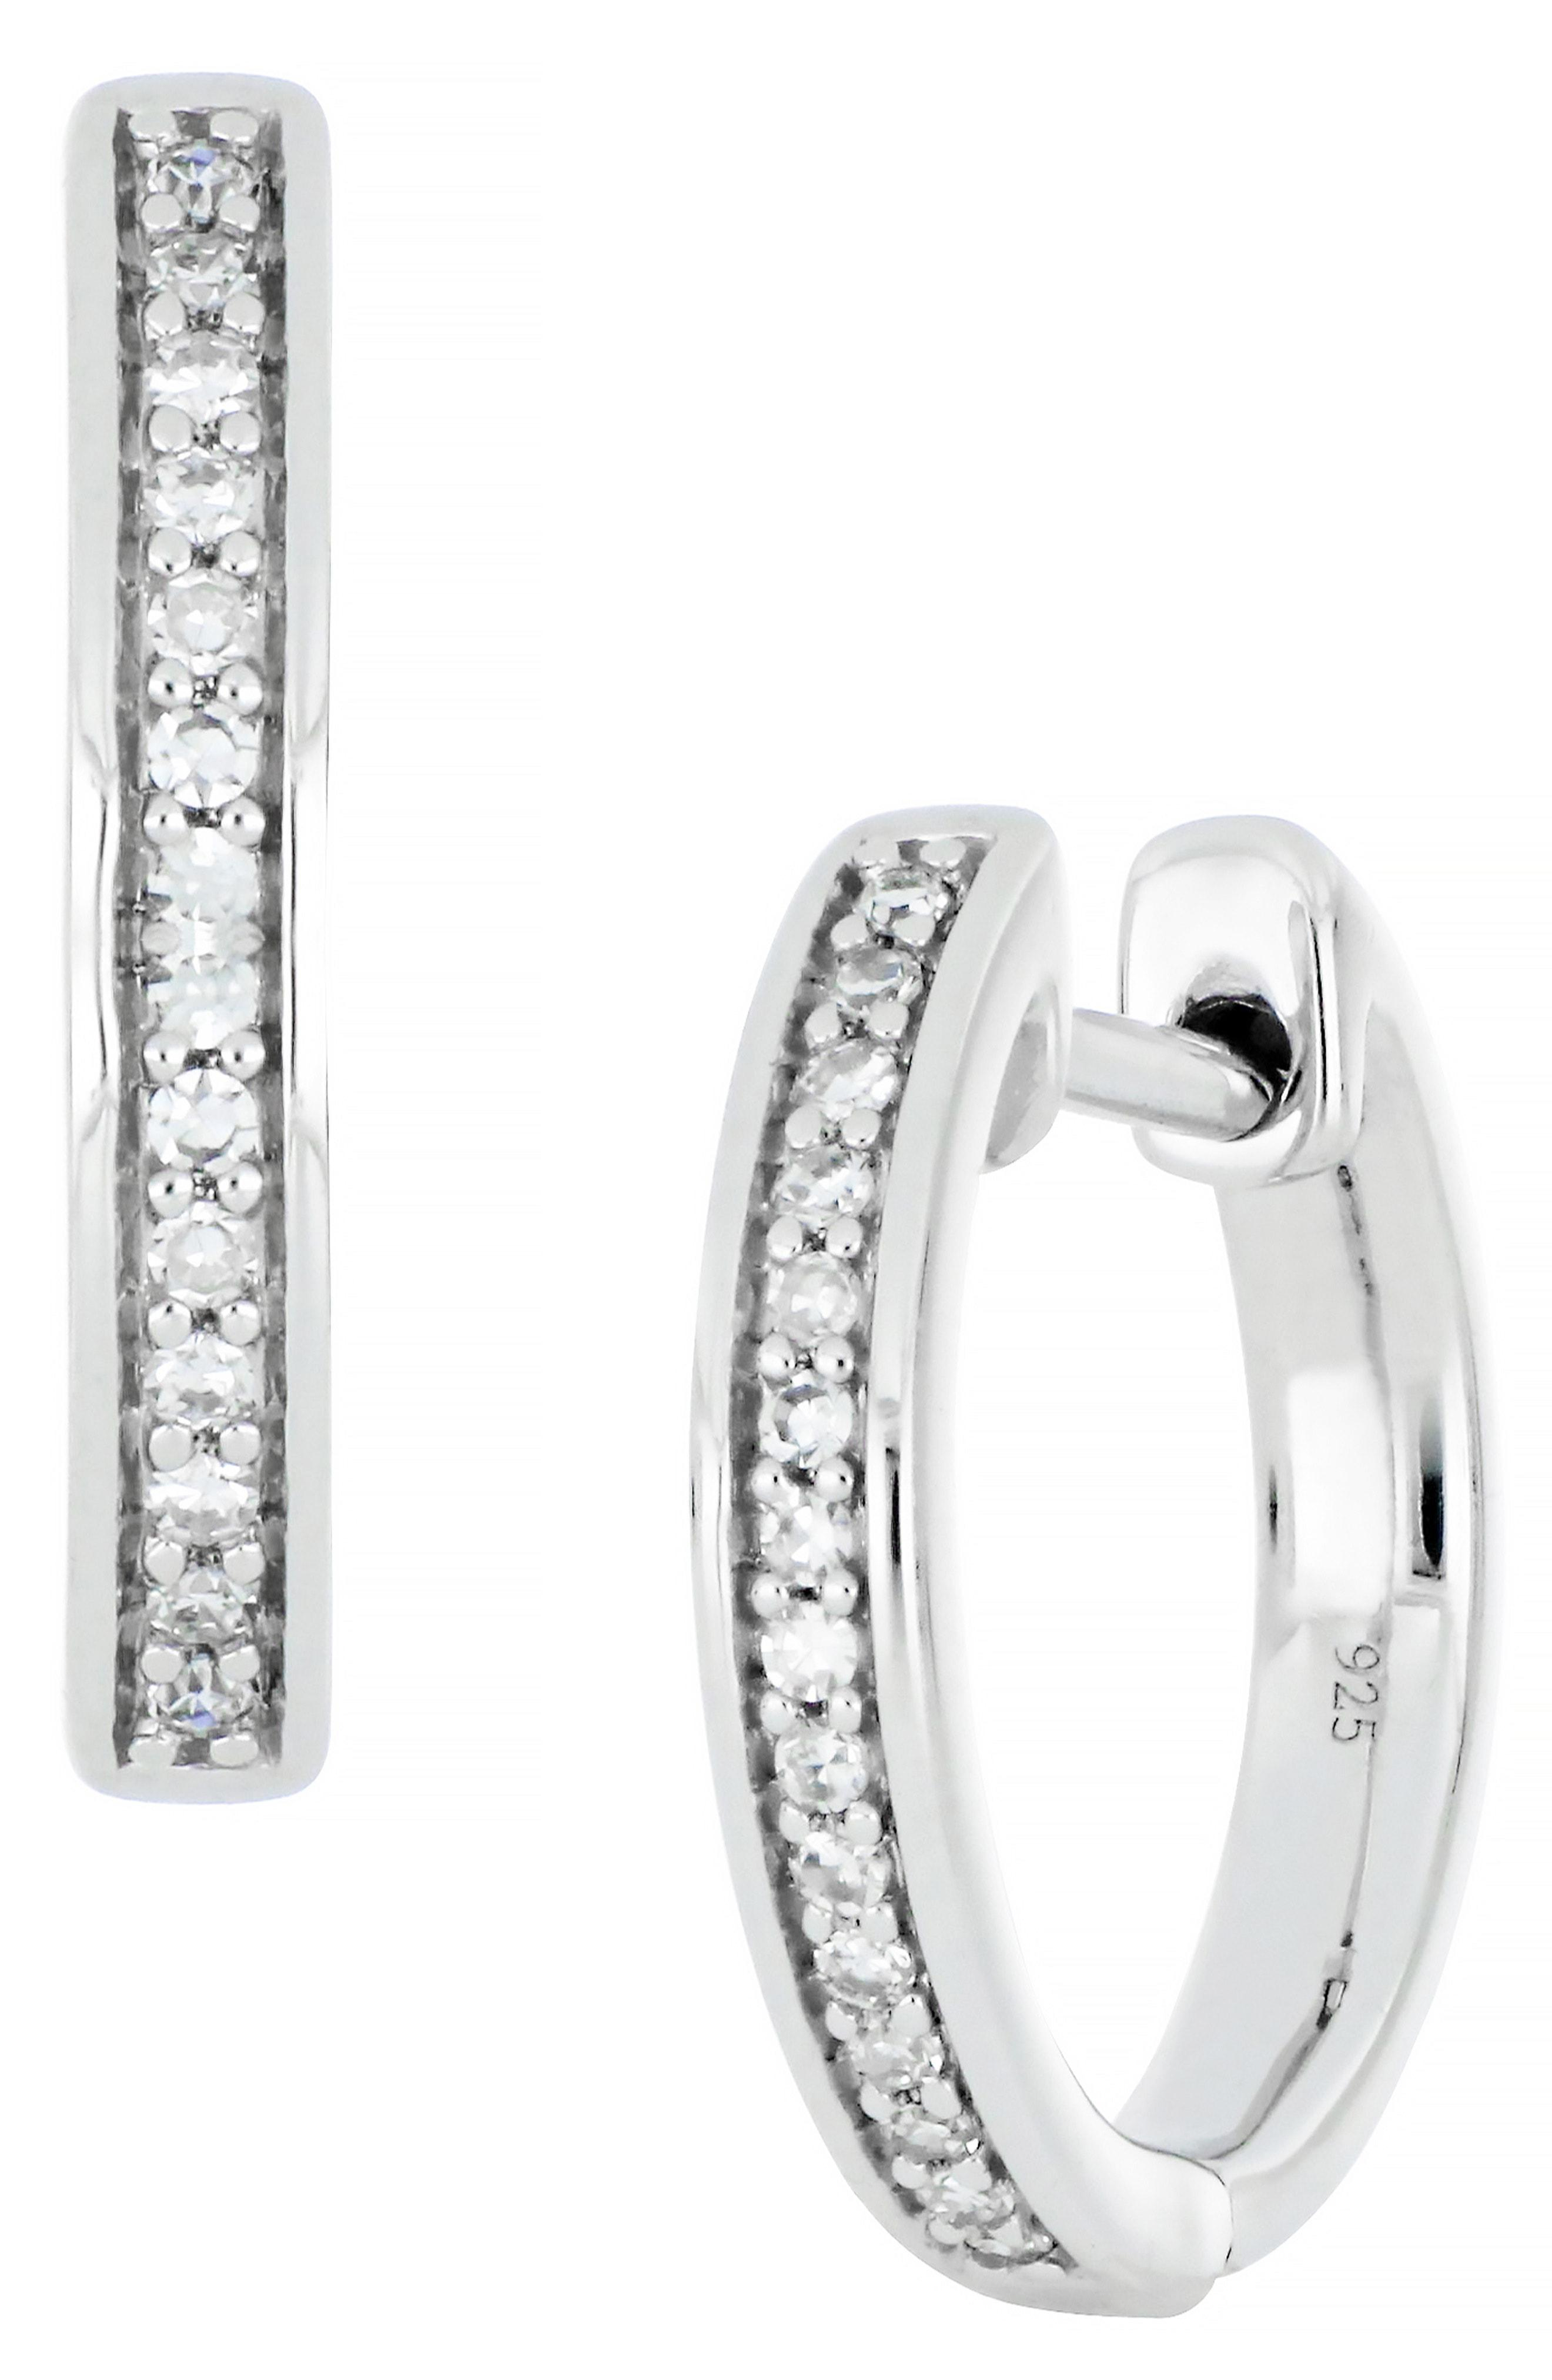 00478f823 Lyst - CARRIERE JEWELRY Carriere Diamond Huggie Earrings (nordstrom ...